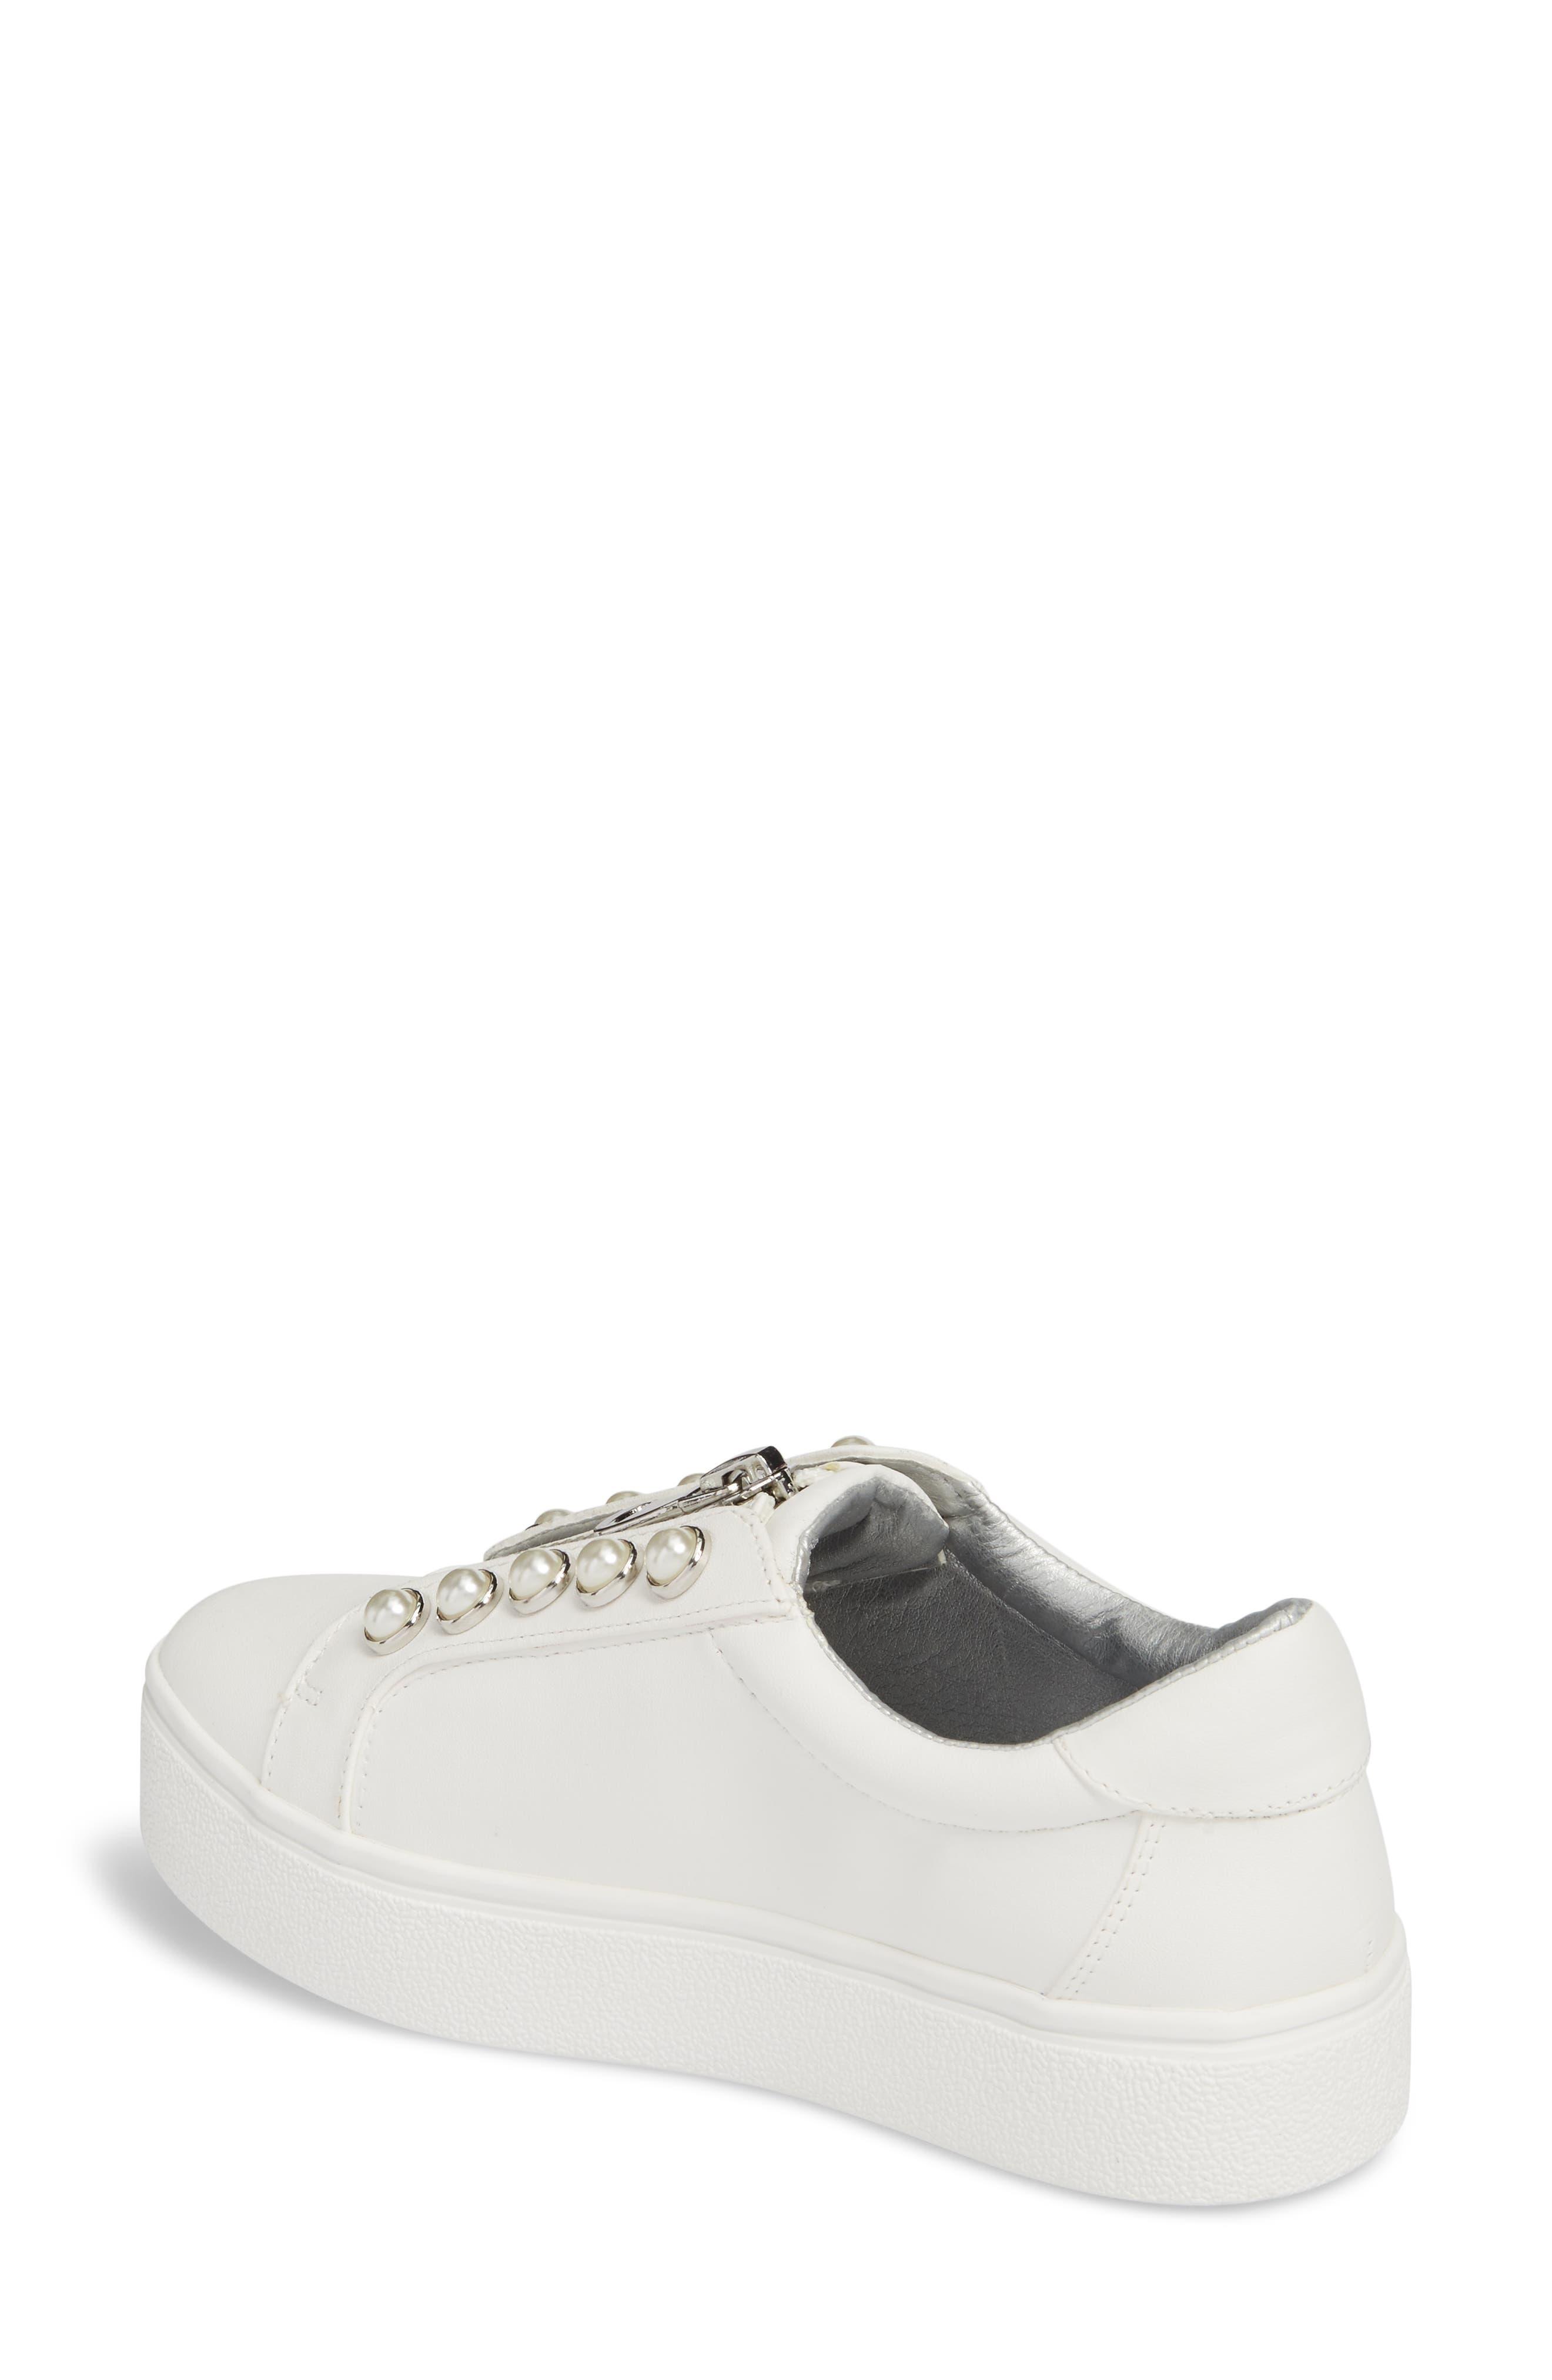 Lynn Embellished Platform Sneaker,                             Alternate thumbnail 2, color,                             White Faux Leather